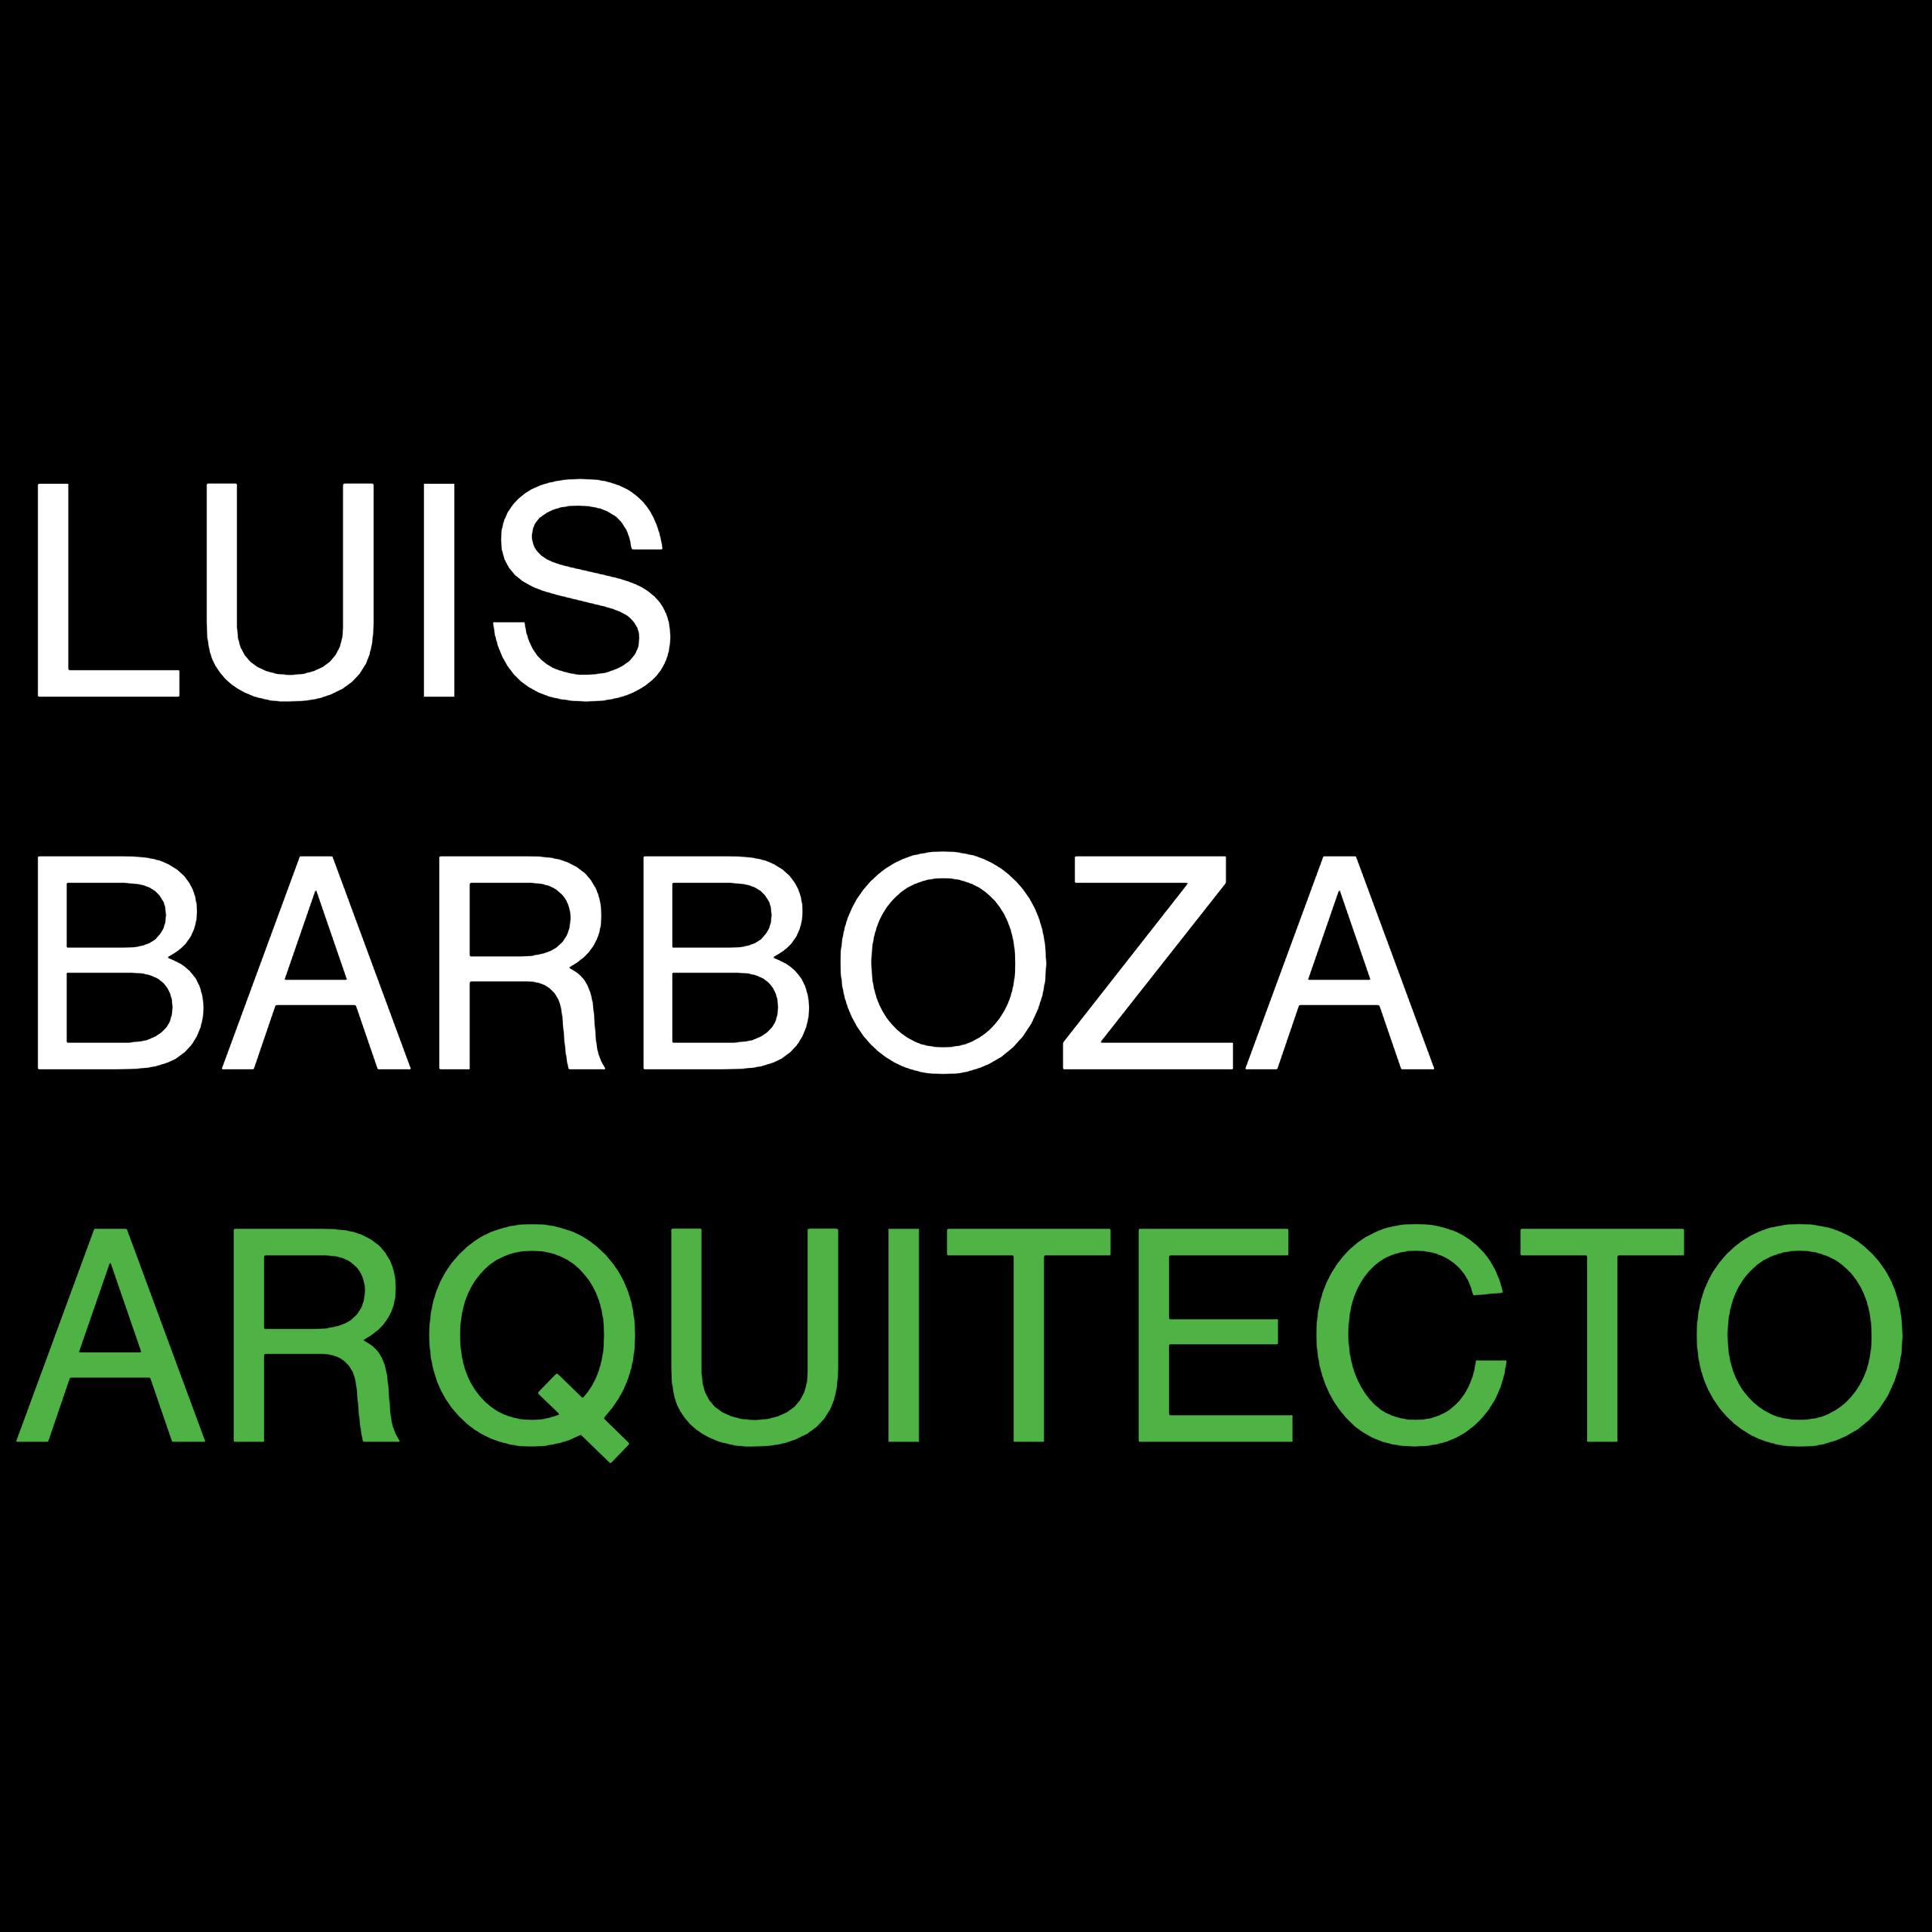 Luis Barboza